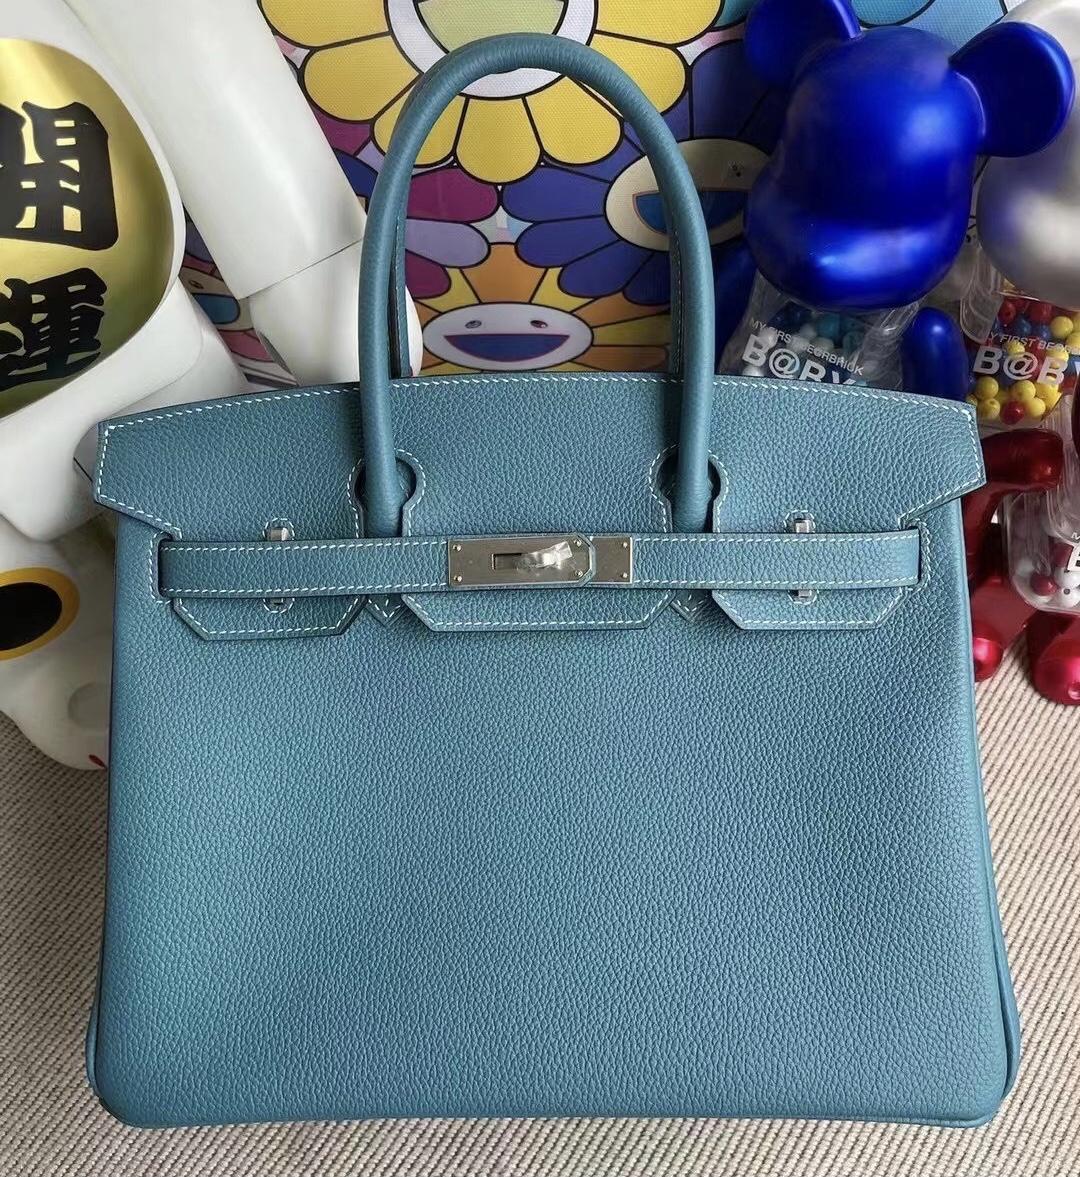 愛馬仕鉑金包 California USA Hermes Birkin 30 Togo 75 牛仔藍 Blue Jean 銀扣